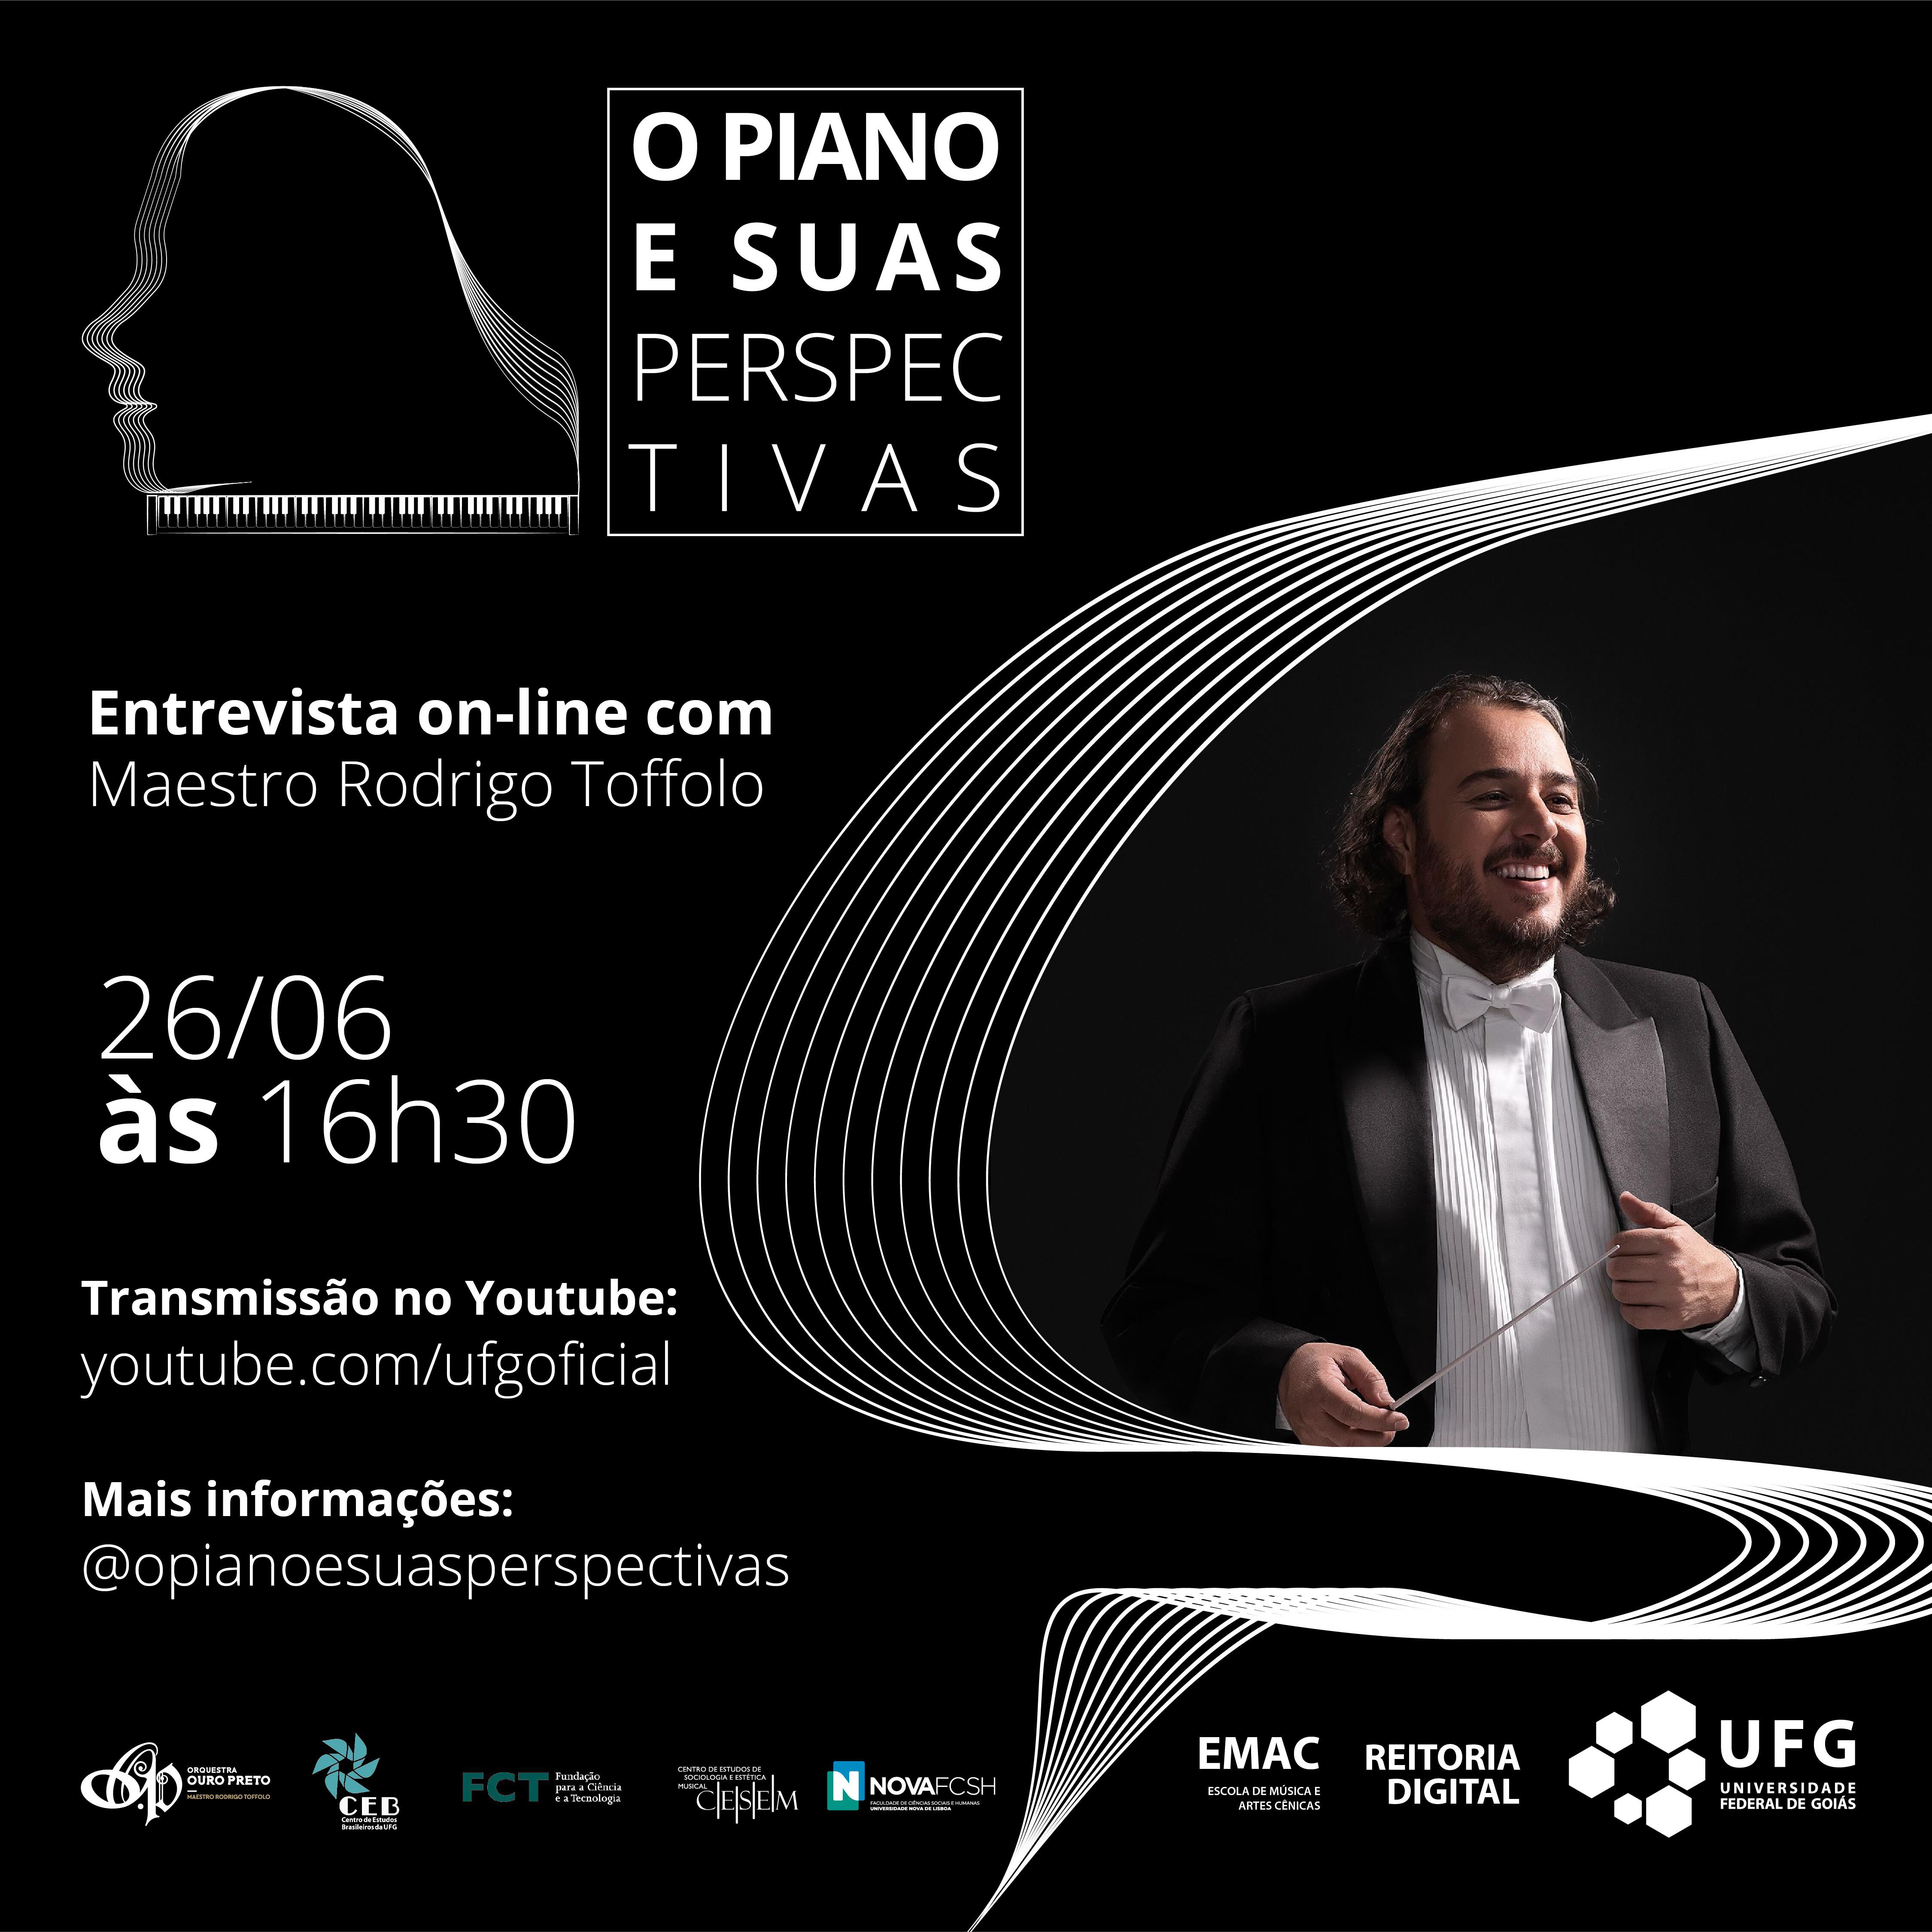 Piano__post__1080x1080px_Prancheta_1